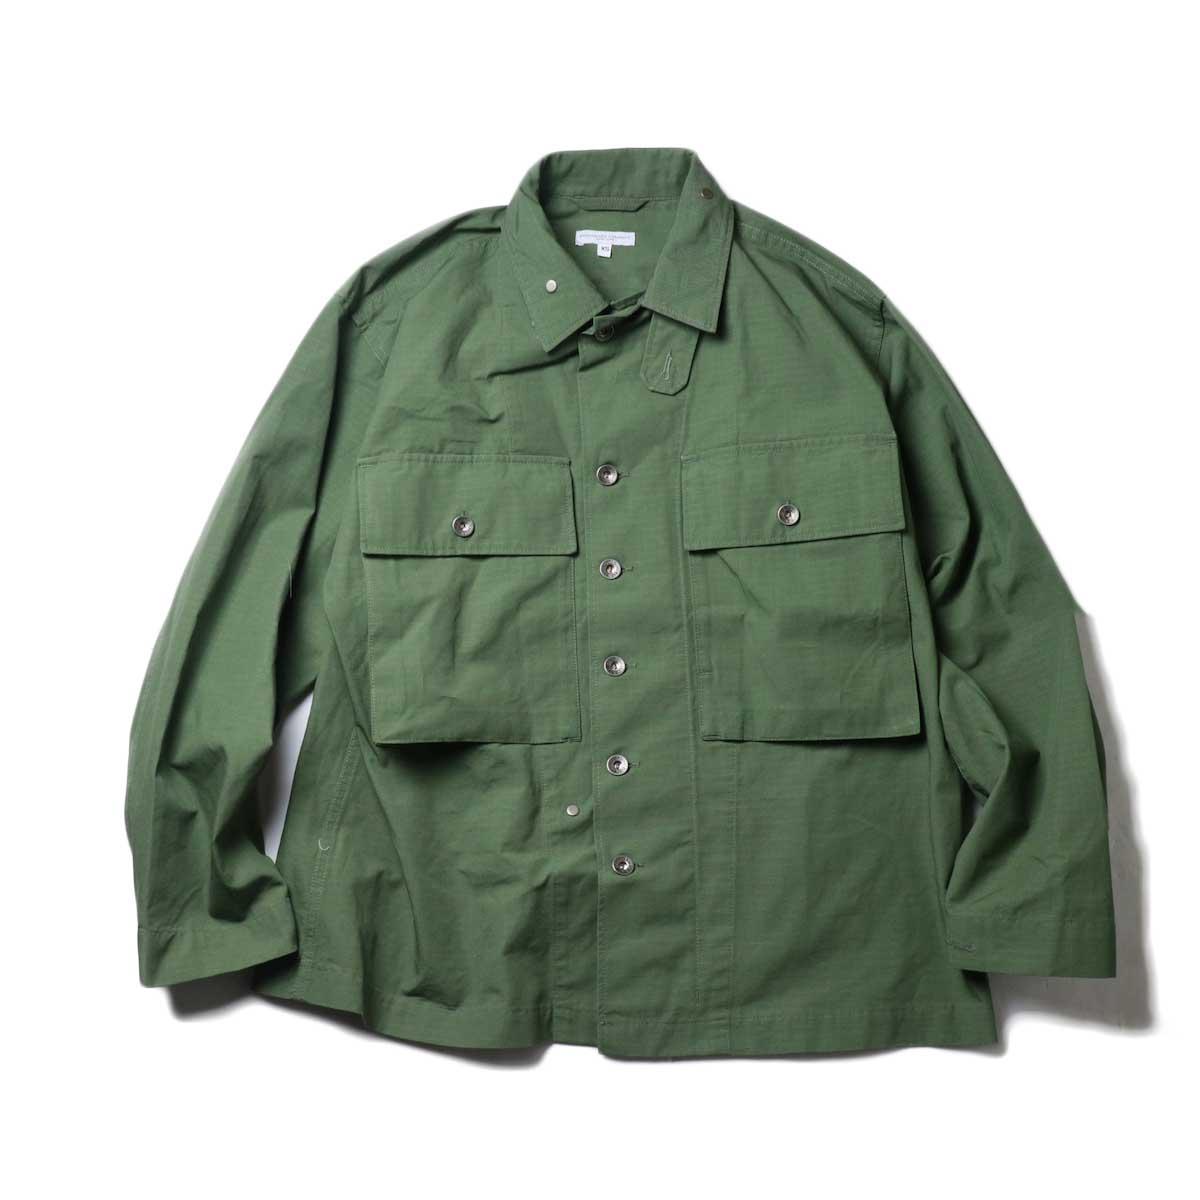 Engineered Garments / M43/2 Shirt Jacket -Cotton Ripstop (Olive)